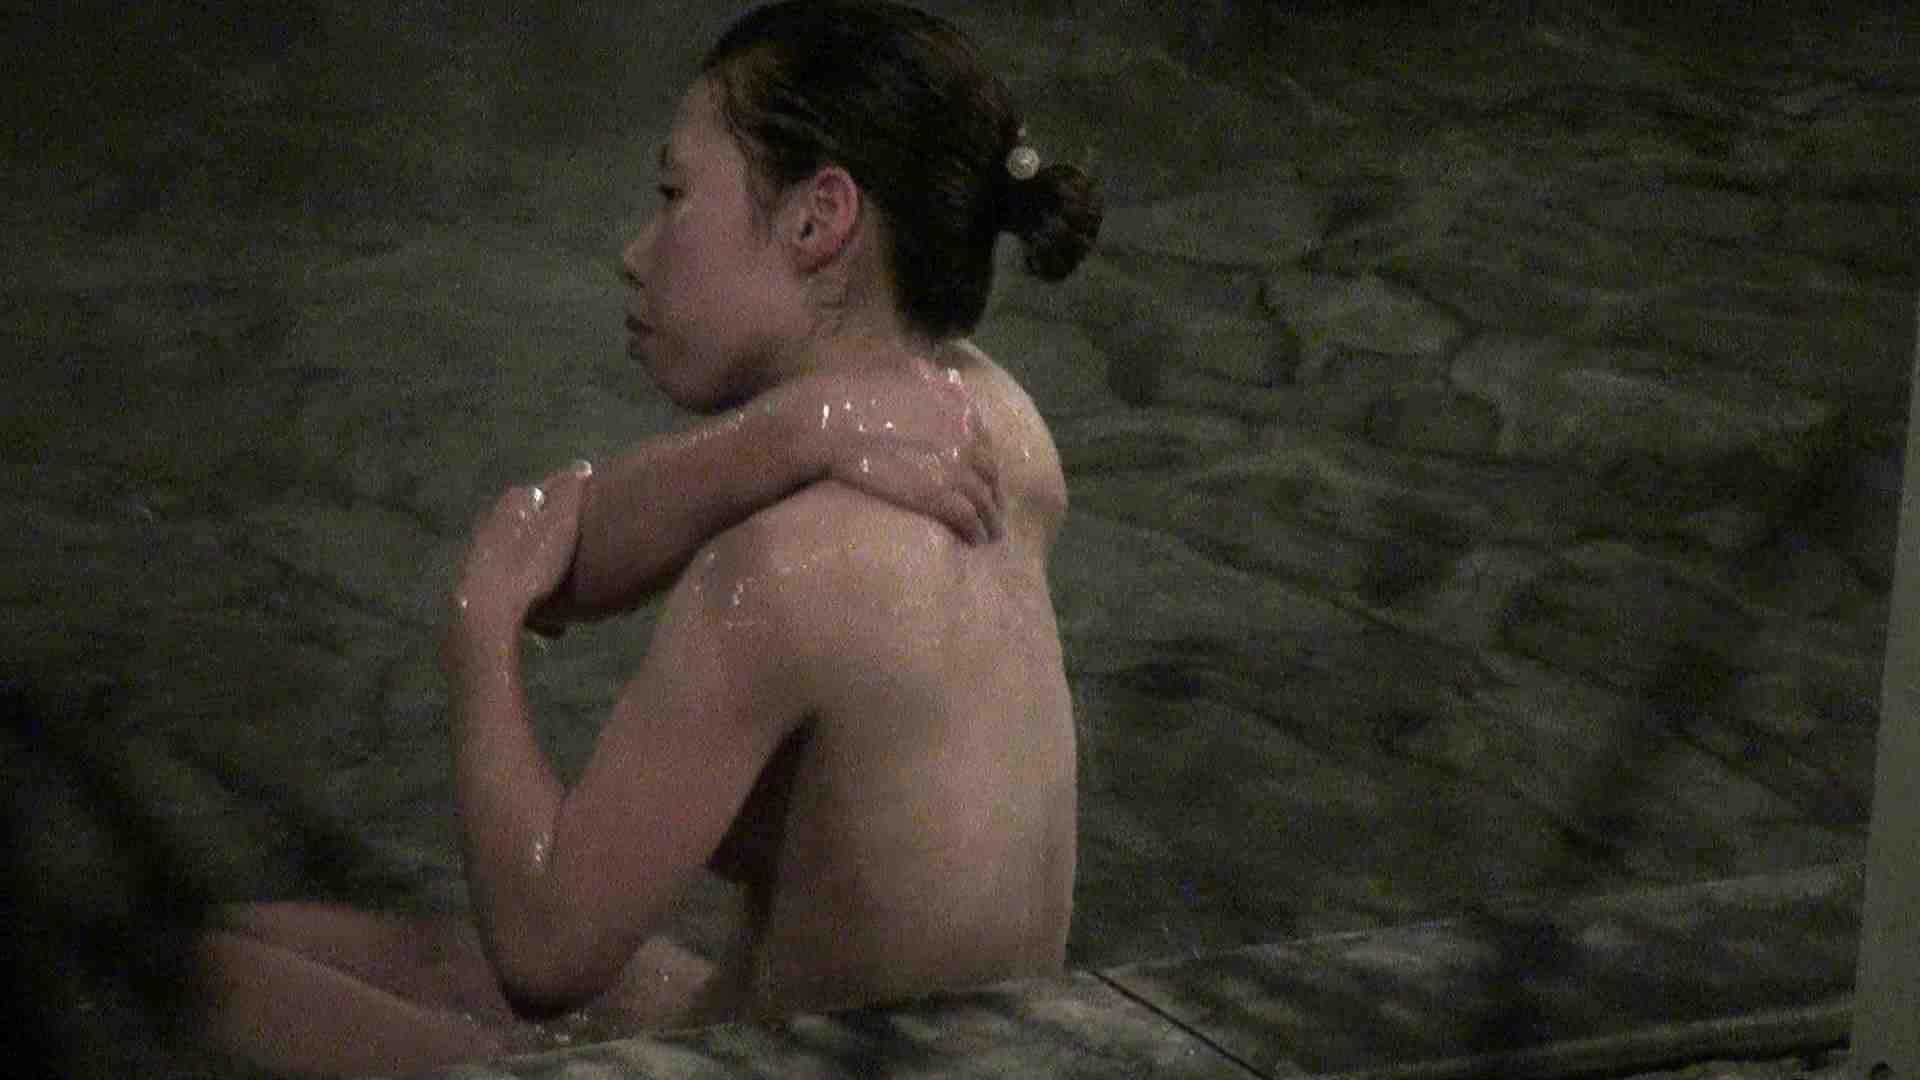 Aquaな露天風呂Vol.391 OLのエロ生活 | 露天風呂  58連発 37